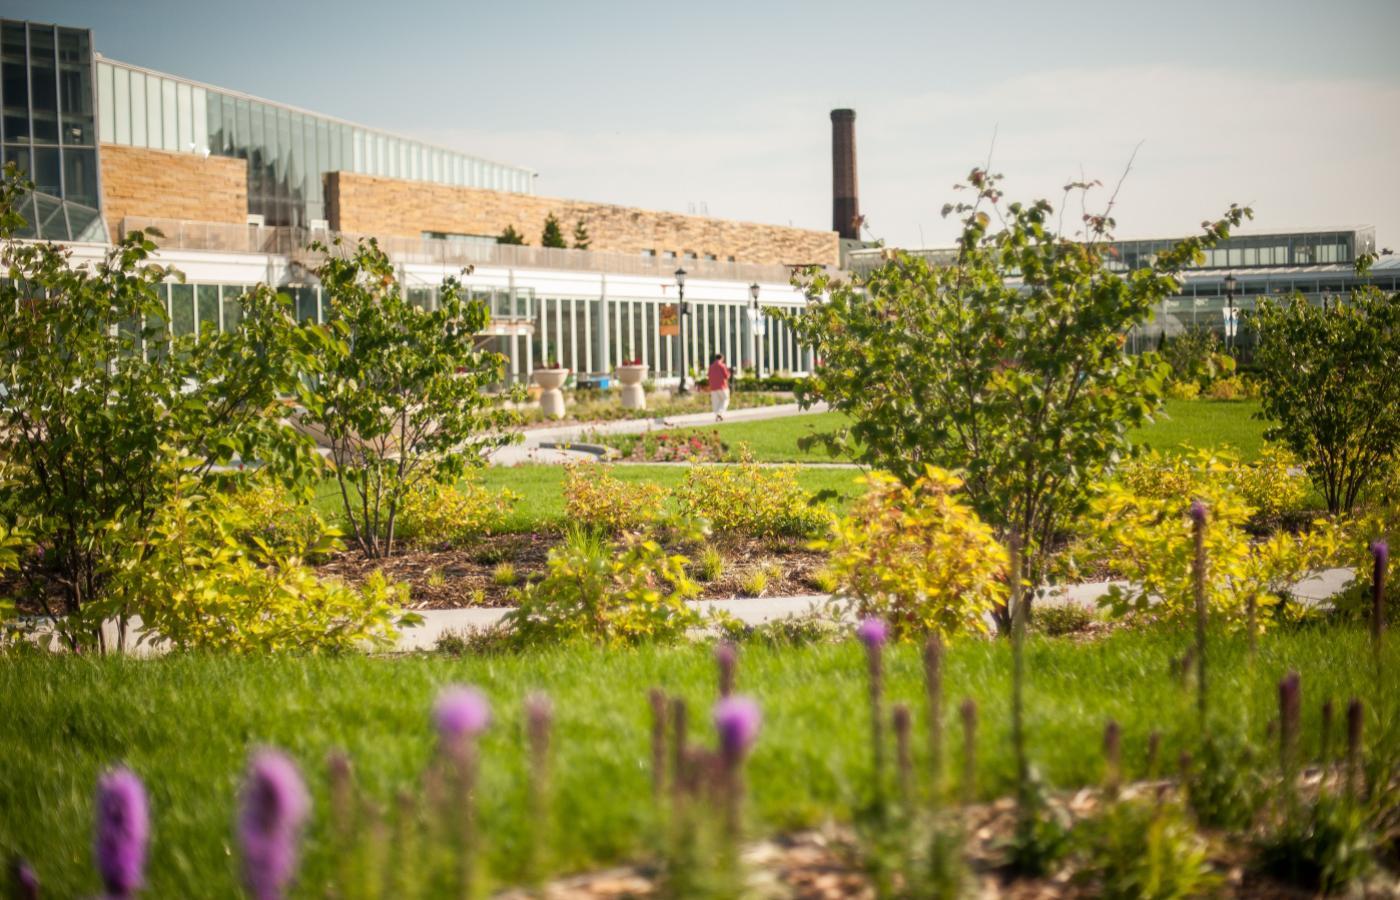 Minnesota Garden at Como Park - 6